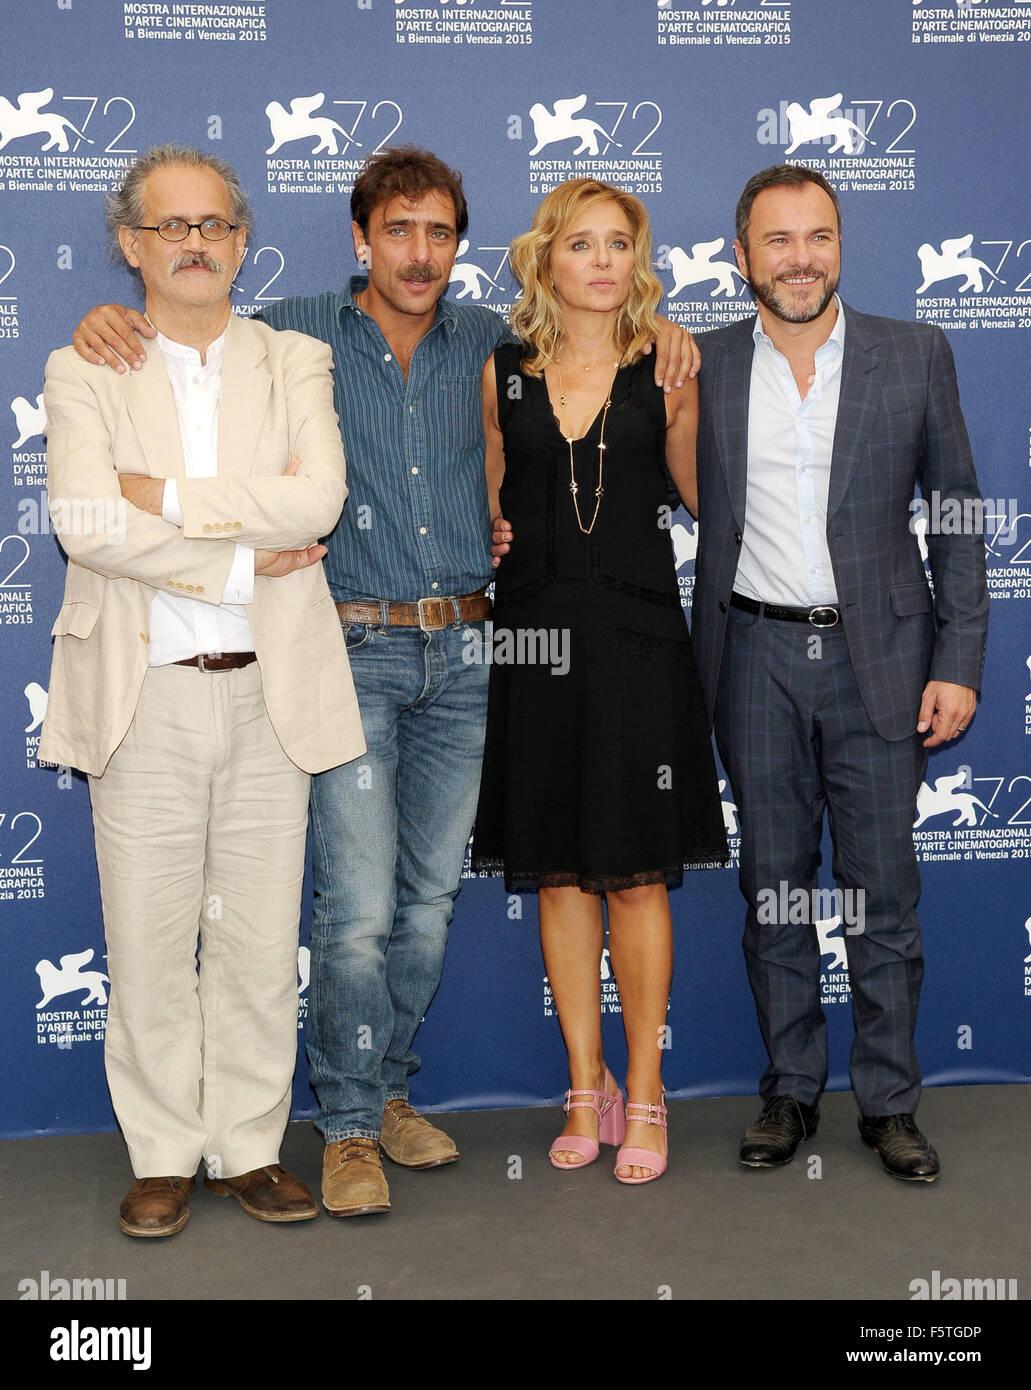 "72º Festival de Cine de Venecia - ""Por Amor"" - Vostro Photocall Featuring: Giuseppe Gaudino, Adriano Imagen De Stock"